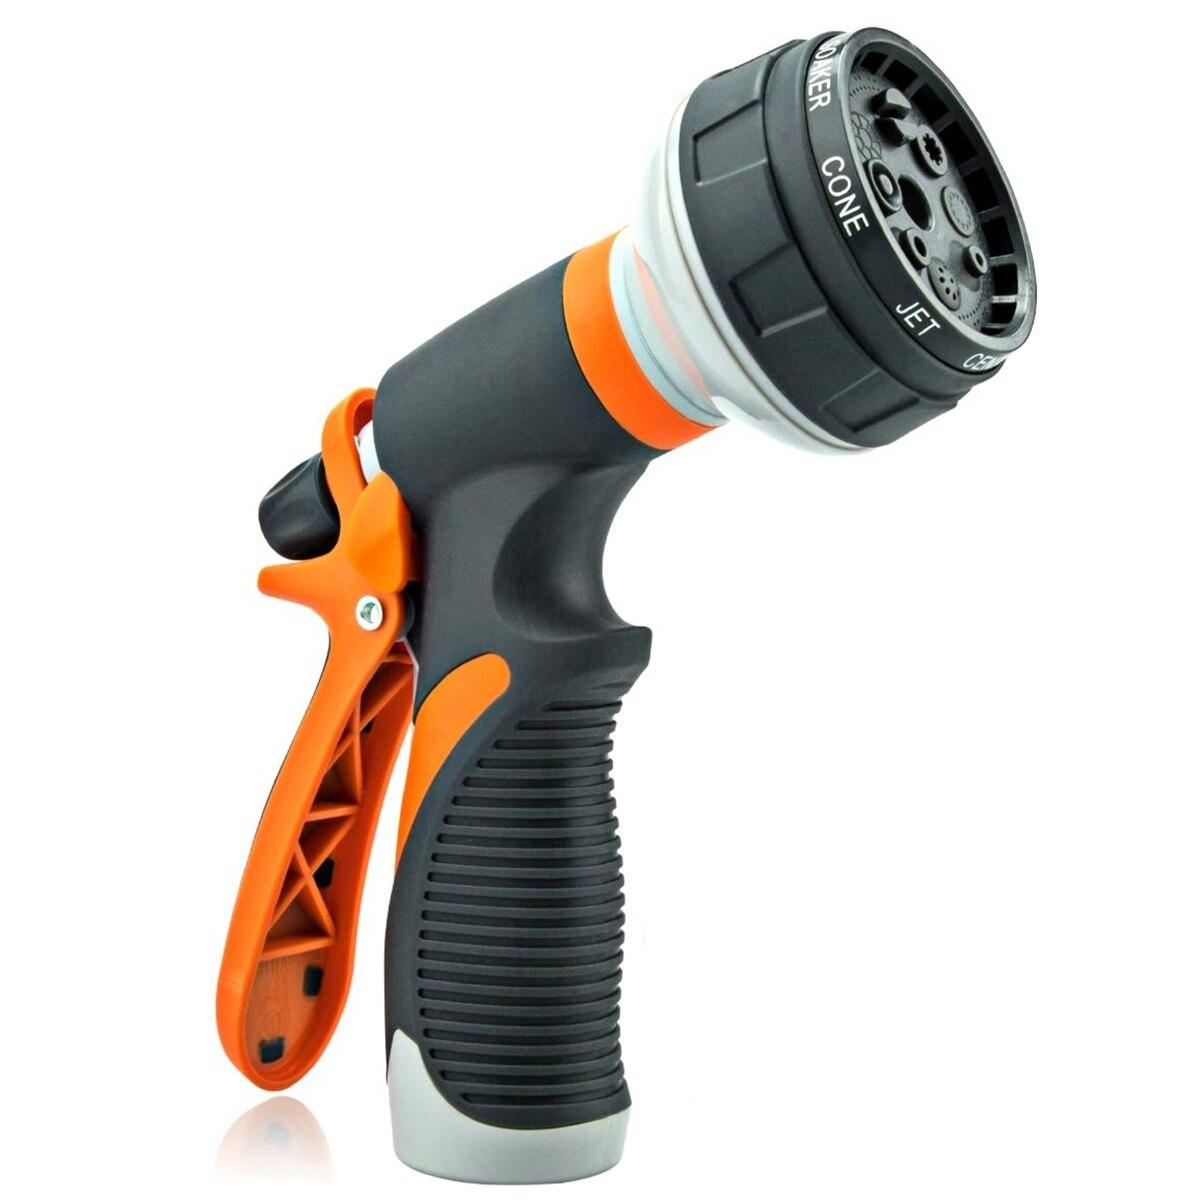 Shower Wand Hose Nozzle Watering Hand Sprayer Plant Irrigation Outdoor Garden Gr